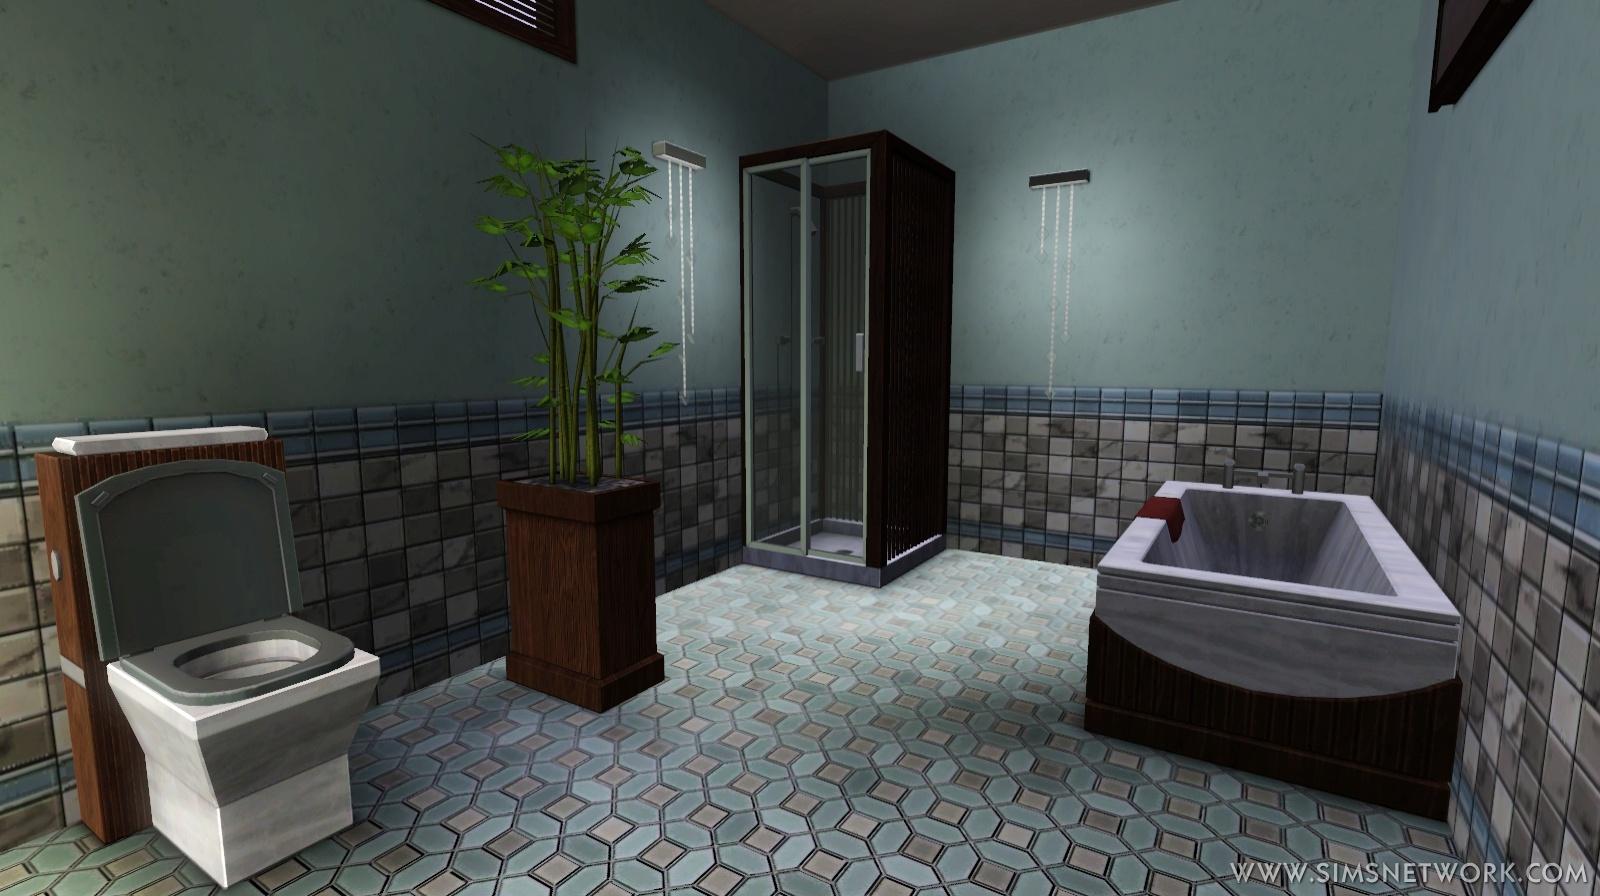 De Sims 3 Slaap En Badkamer Accessoires Review Snw